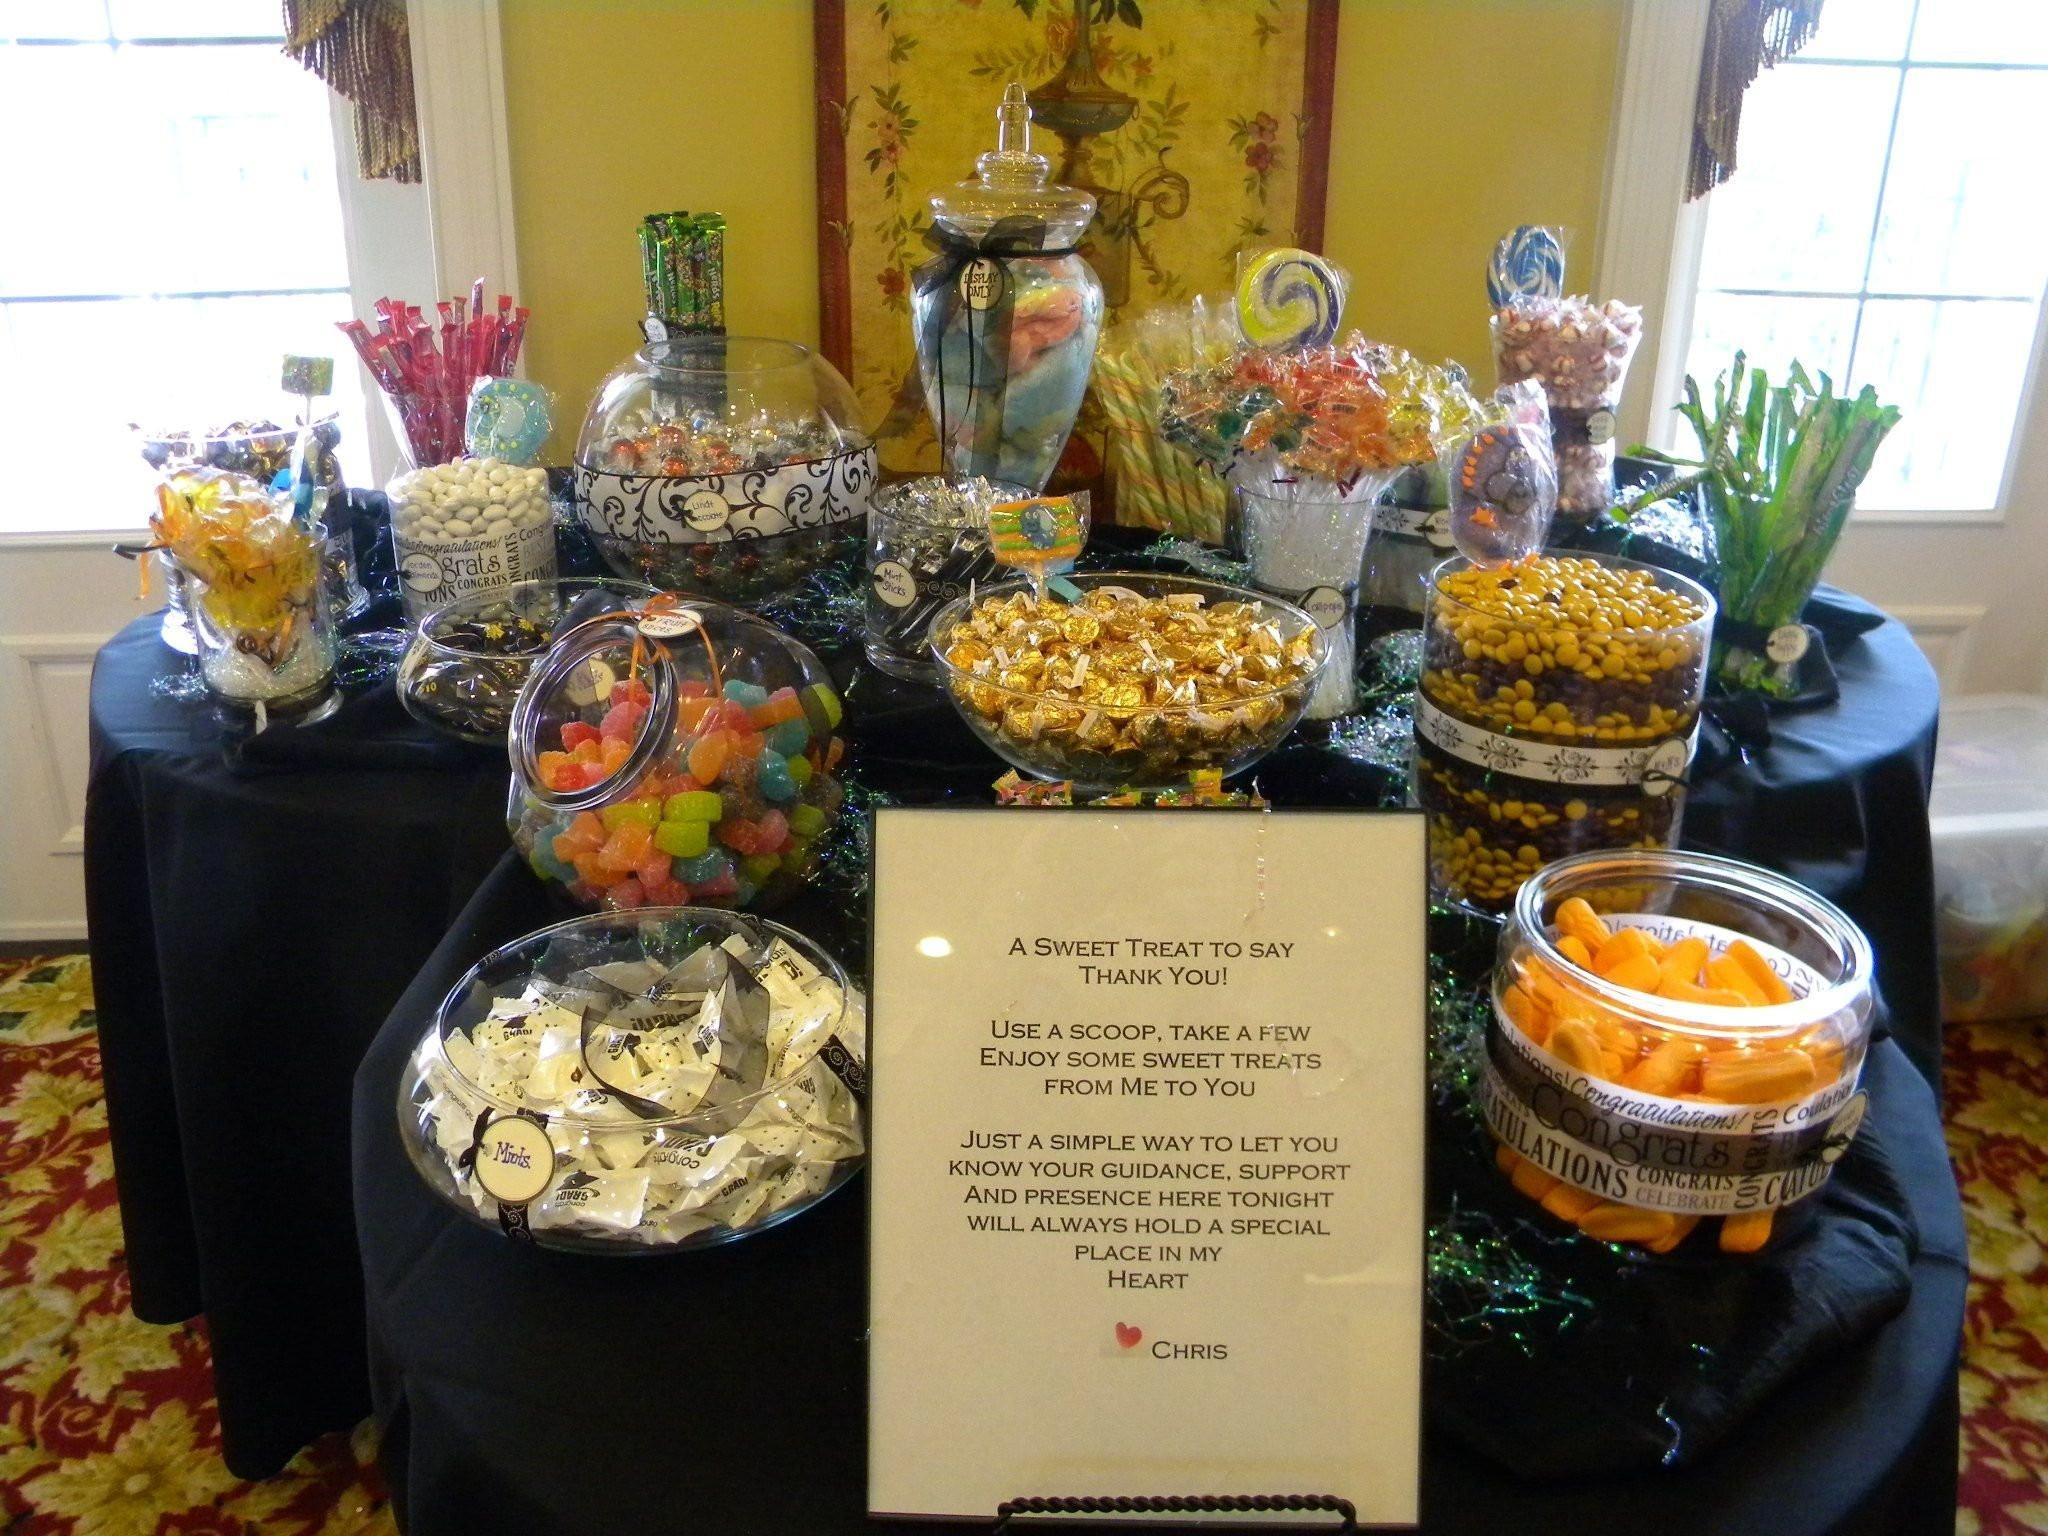 Graduation Party Candy Ideas  10 Spectacular Food Ideas For Graduation Open House 2019